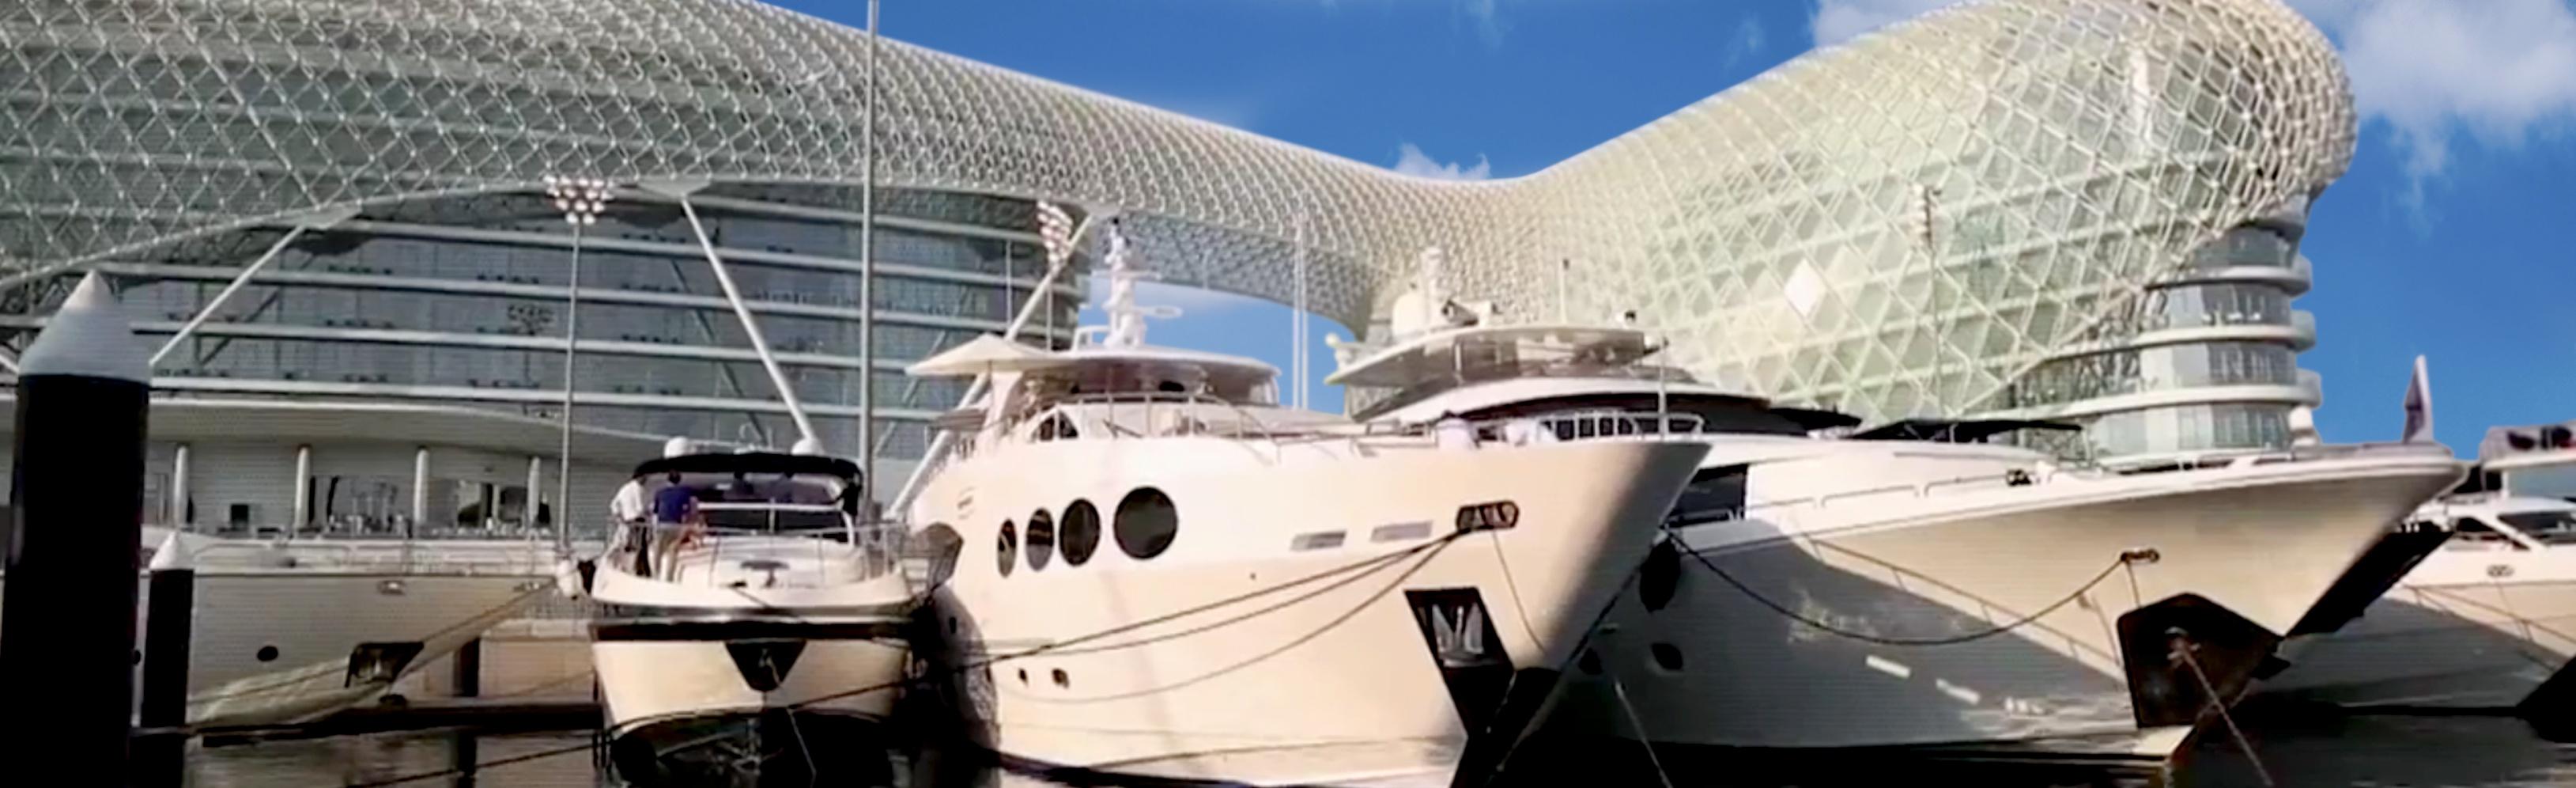 Gulf-Craft---Majesty-Yachts-in-YAS-Marine-Abu-Dhabi-(4).jpg